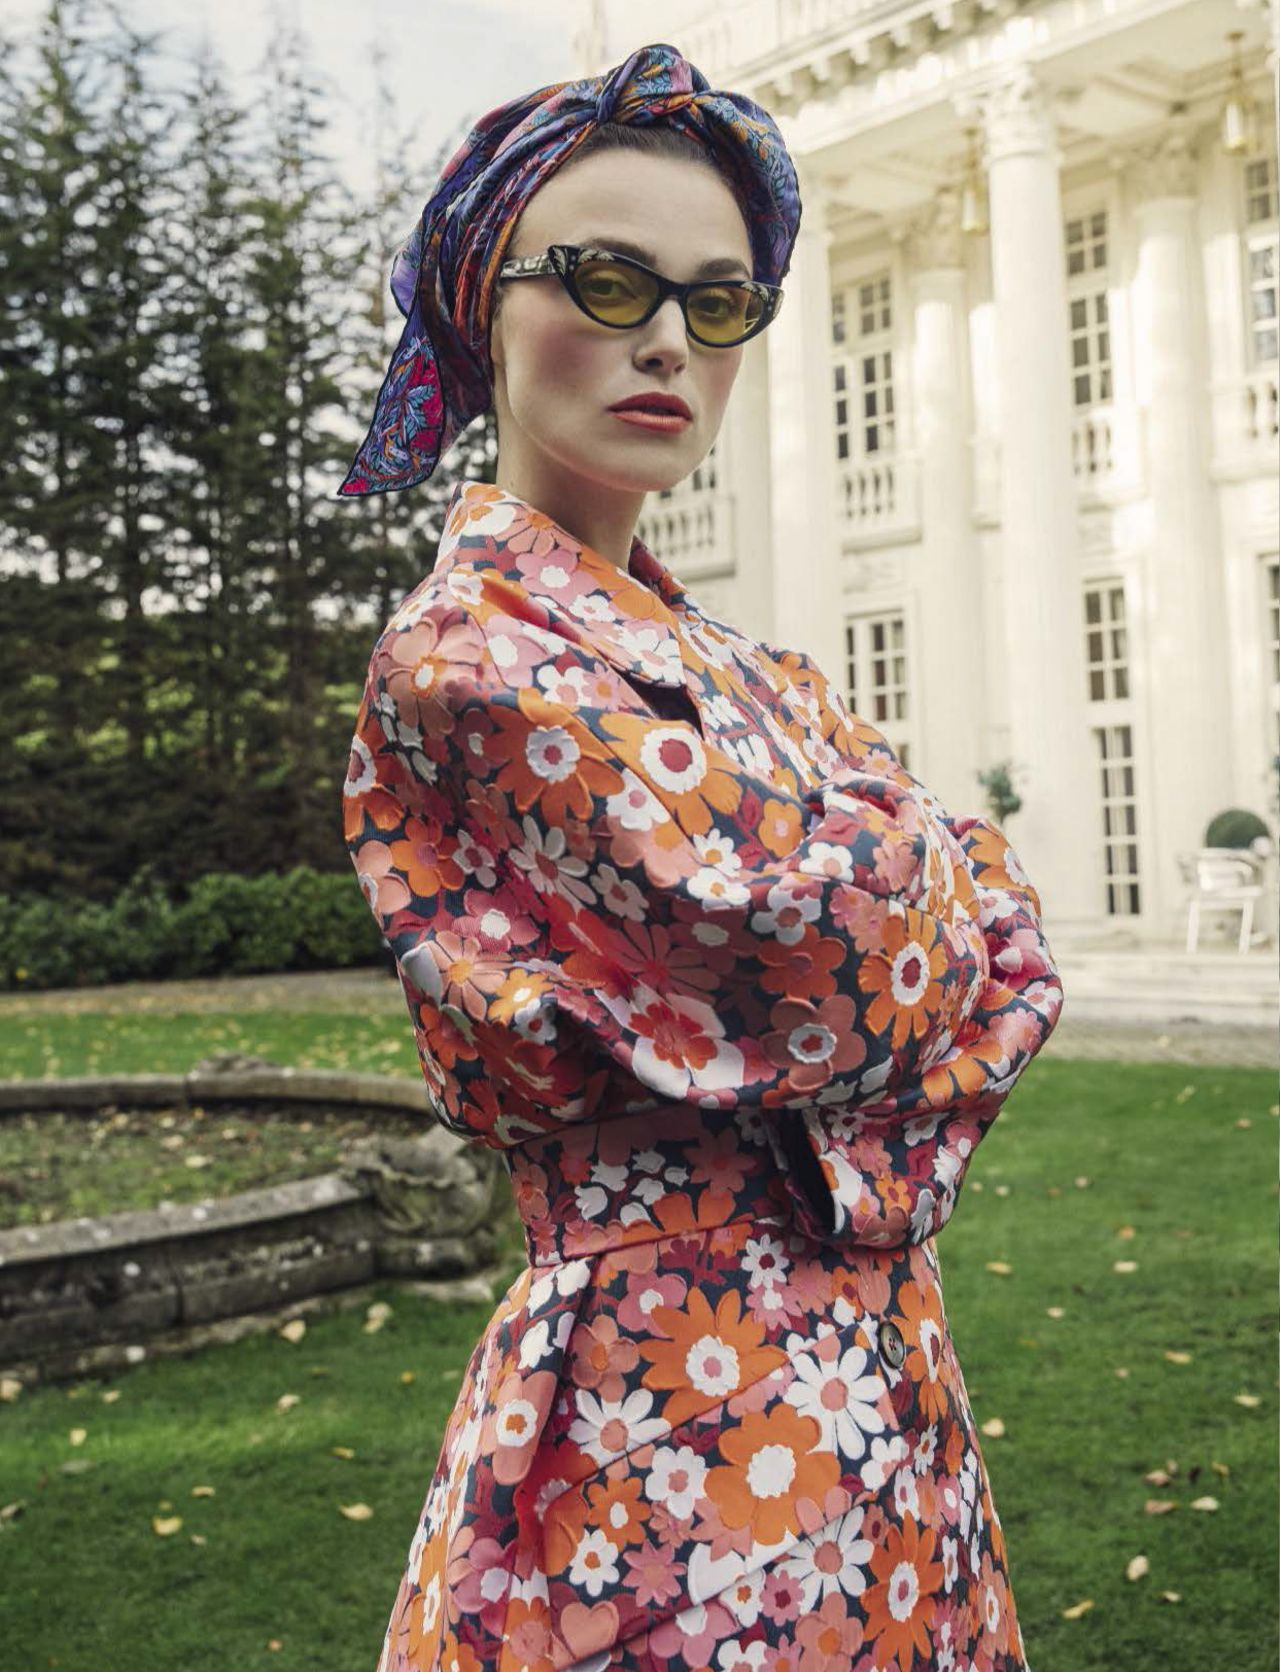 Keira knightley vogue italy april 2019 nudes (36 photos), Paparazzi Celebrites pictures